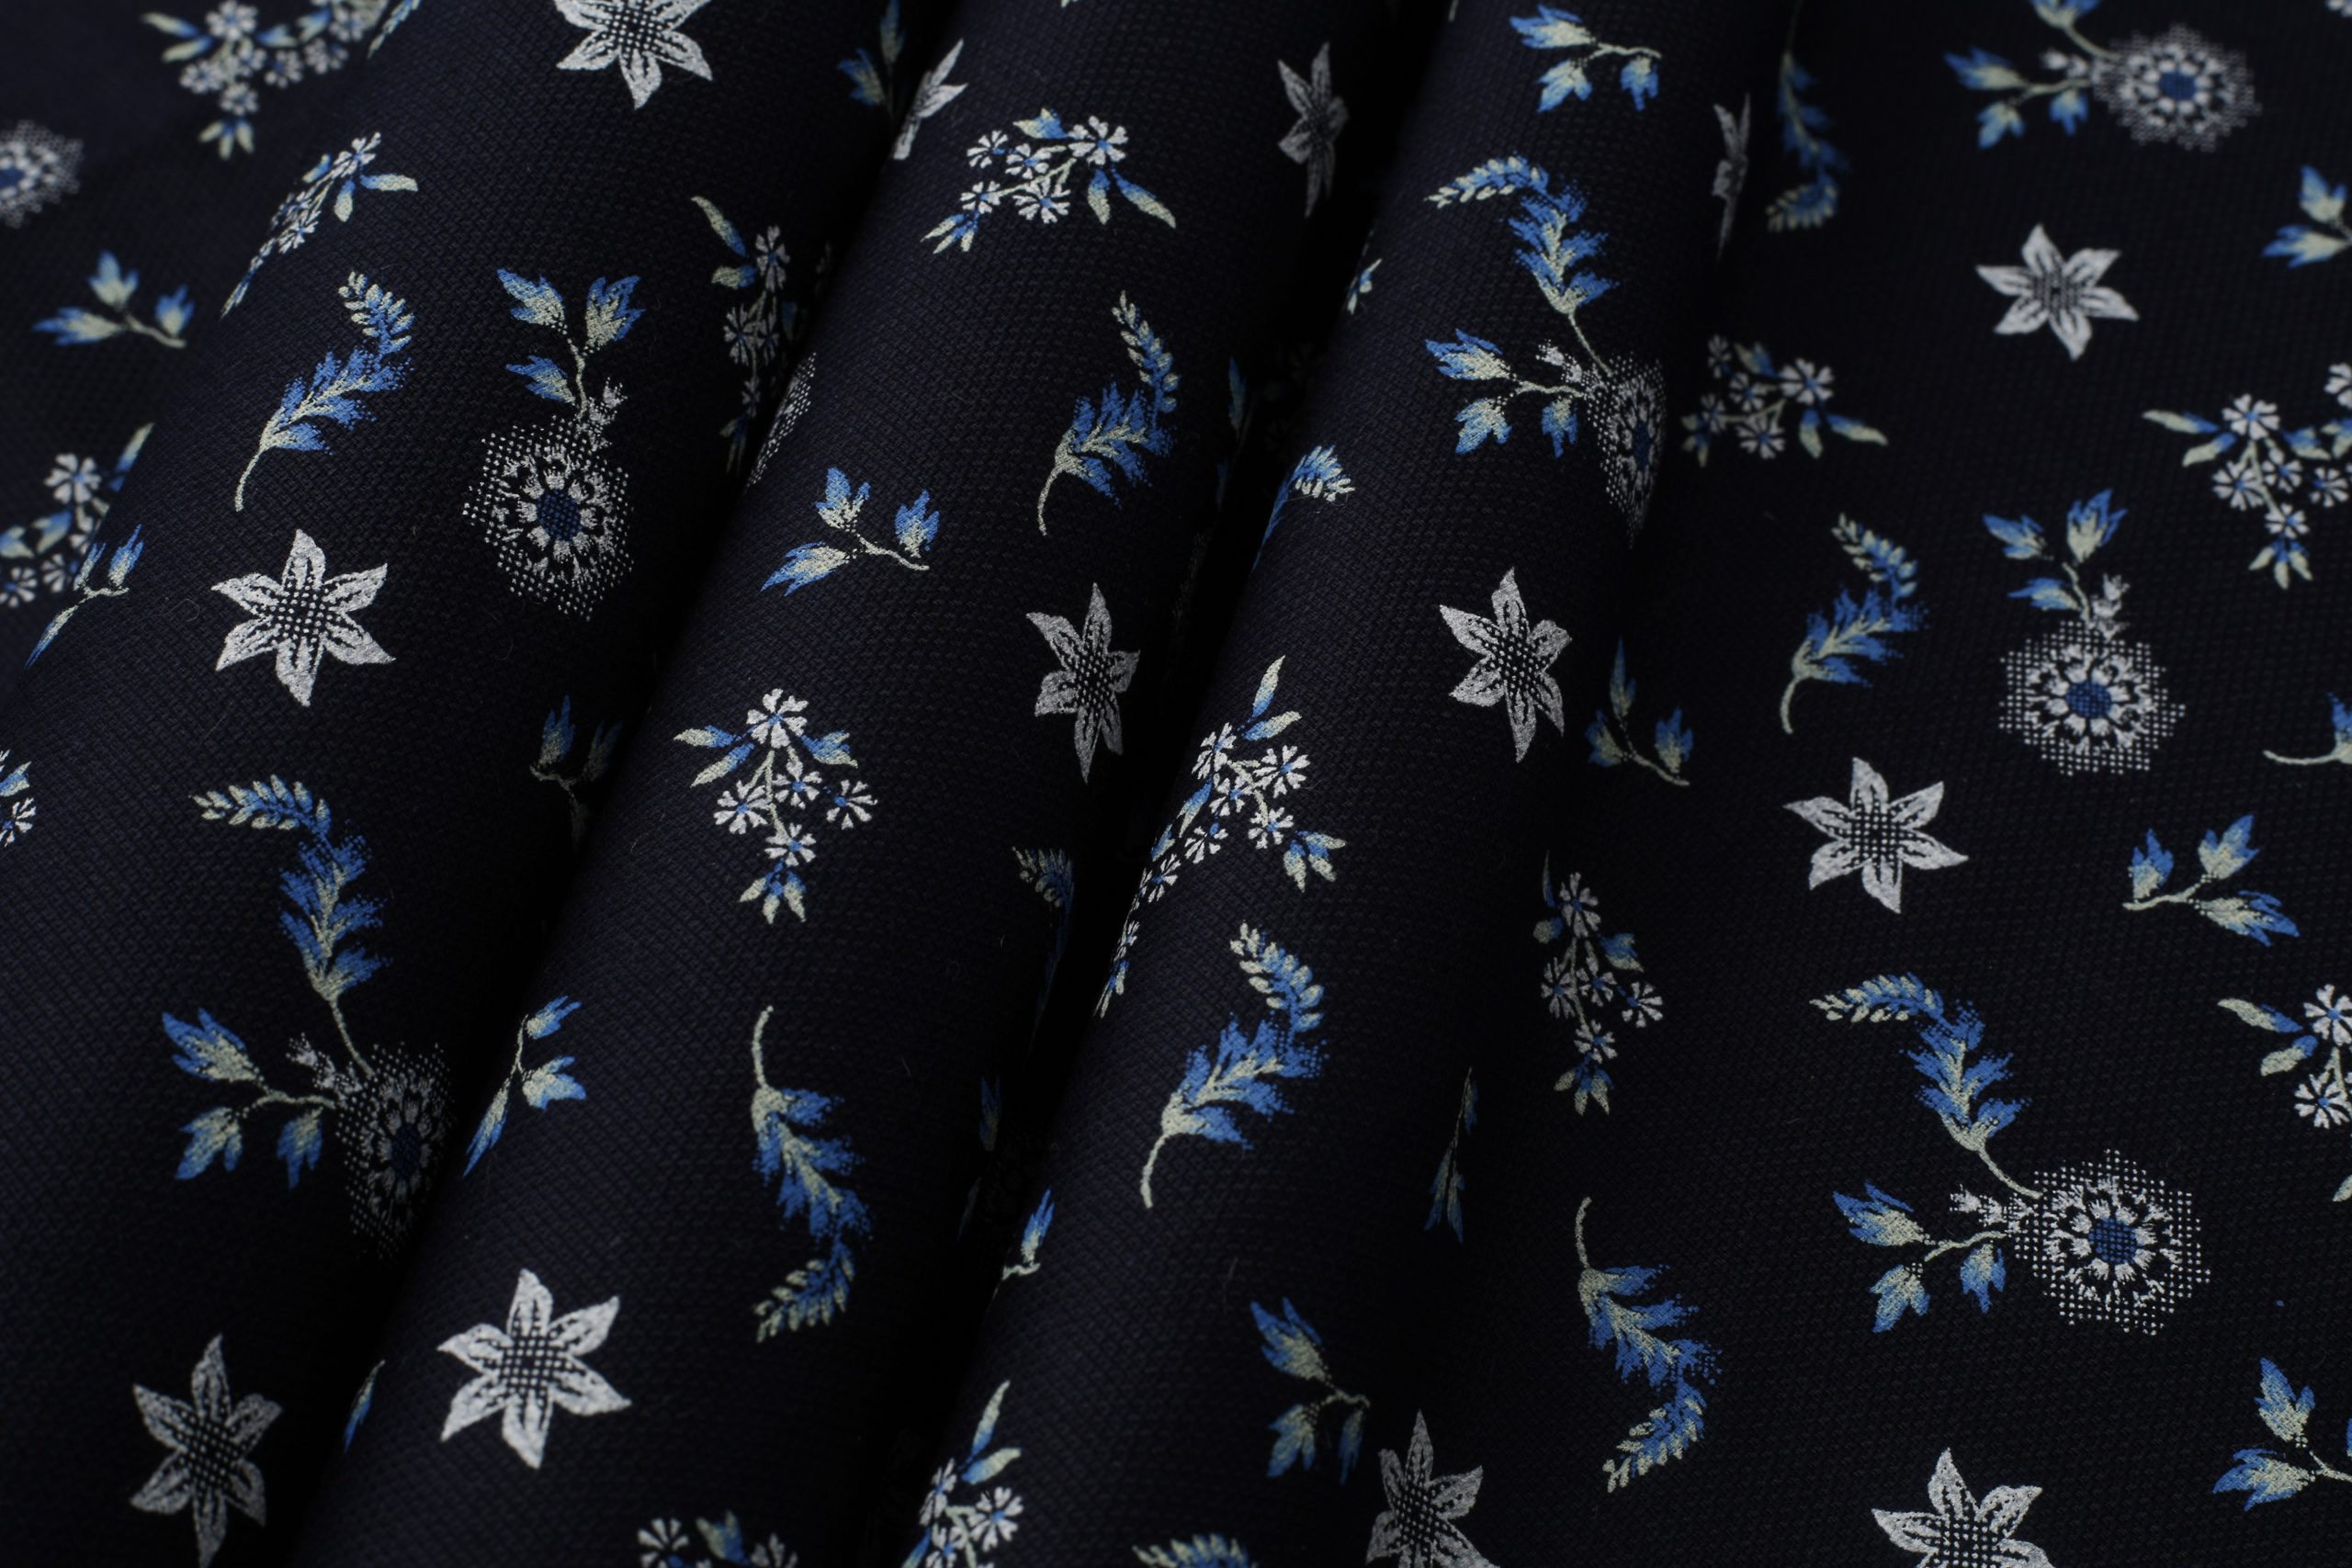 dobby print shirt fabric